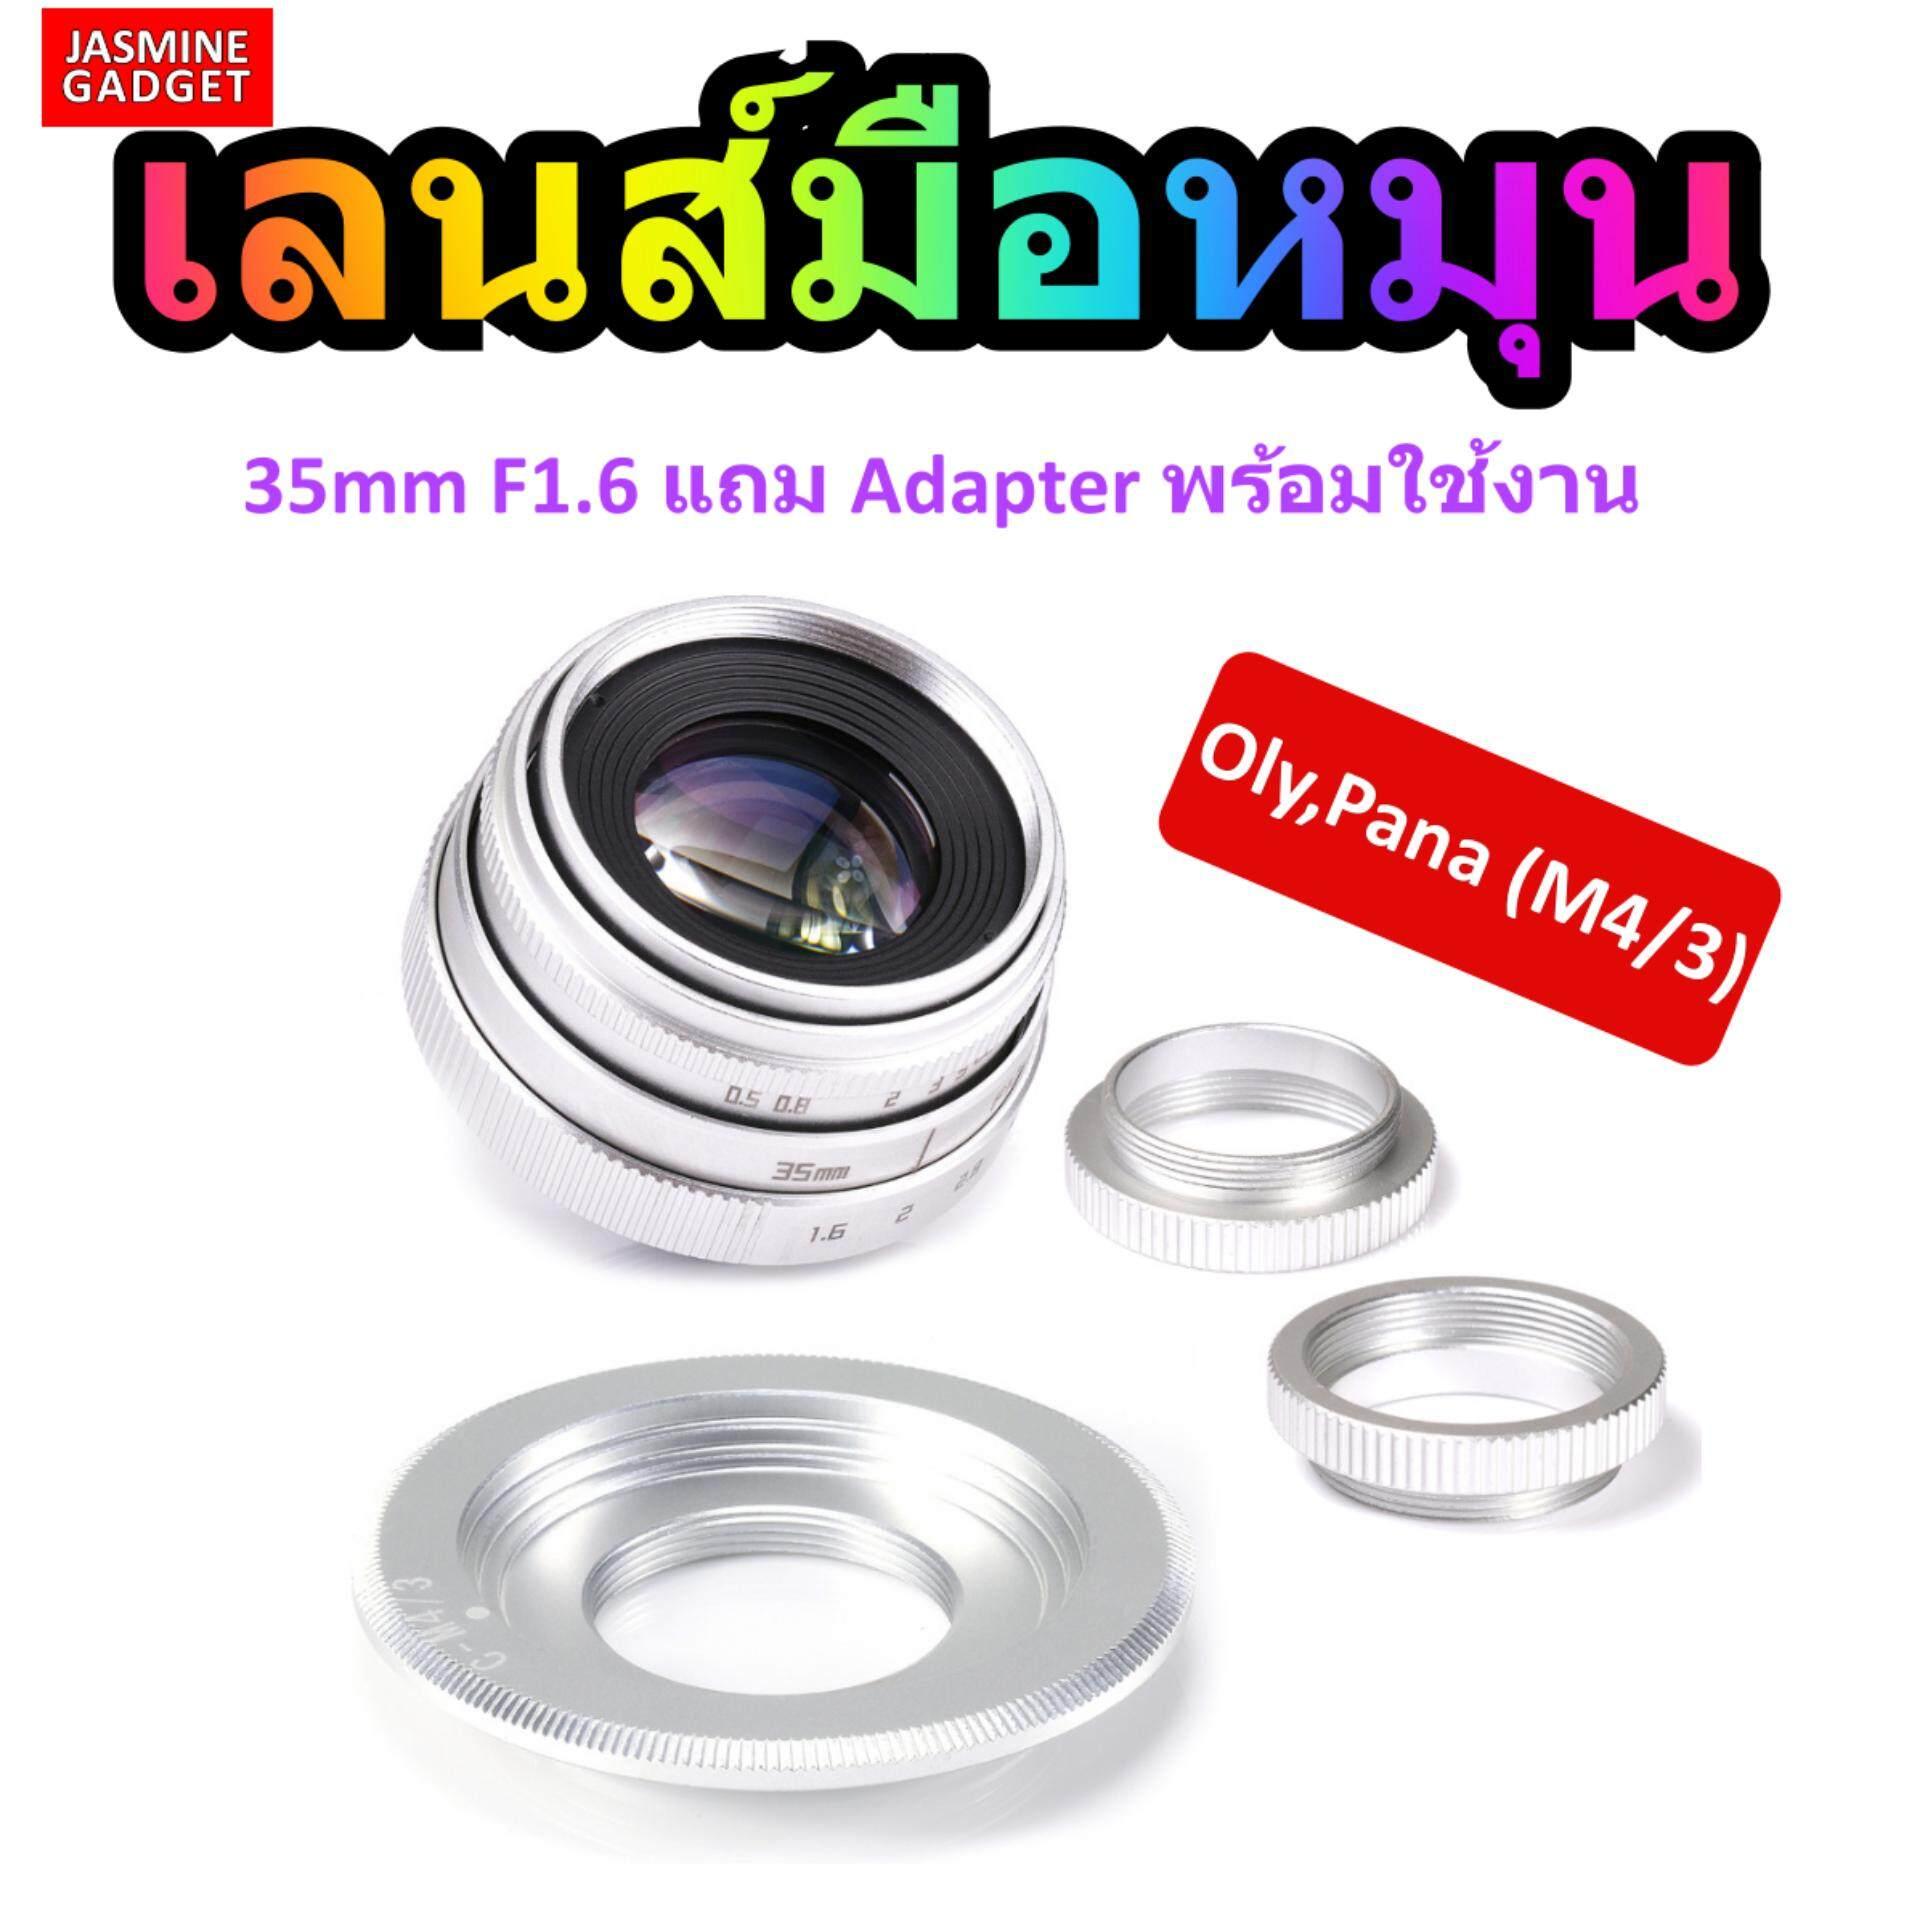 Fujian Cctv Lens 35mm F1.6 Mark Ii เลนส์มือหมุน ละลายหลัง + พร้อม Adapter C-M4/3 For ค่าย Panasonic, Olympus.